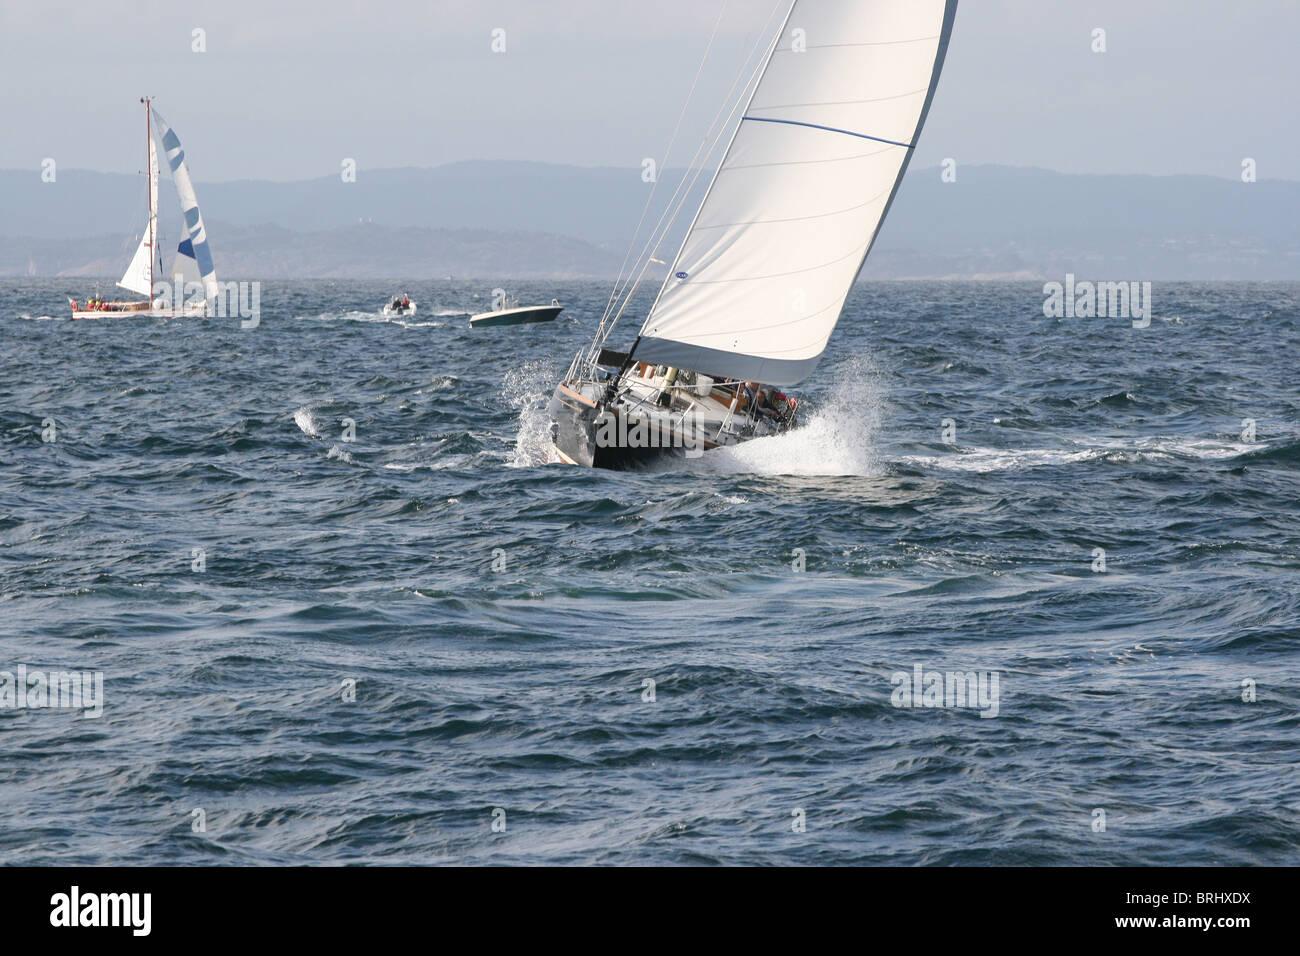 Black Diamond,  The Tall Ships Races 2010, Kristiansand - Stock Image